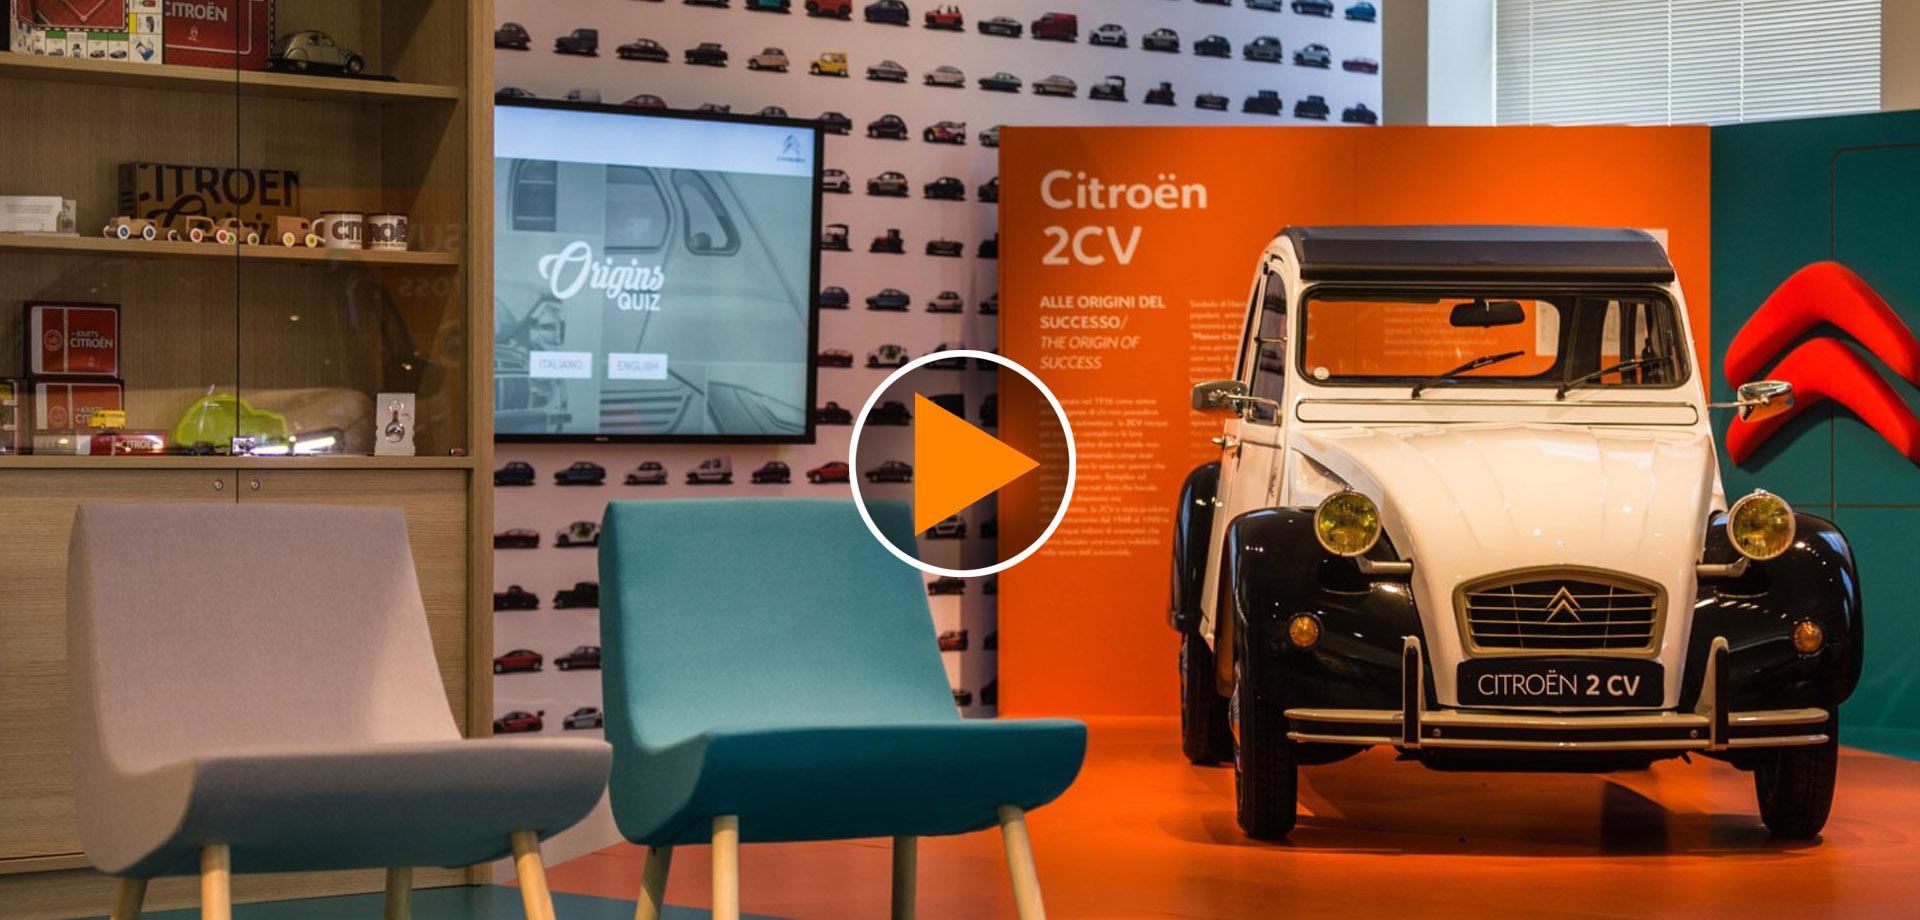 Citroën ALLA MILANO DESIGN WEEK 2019